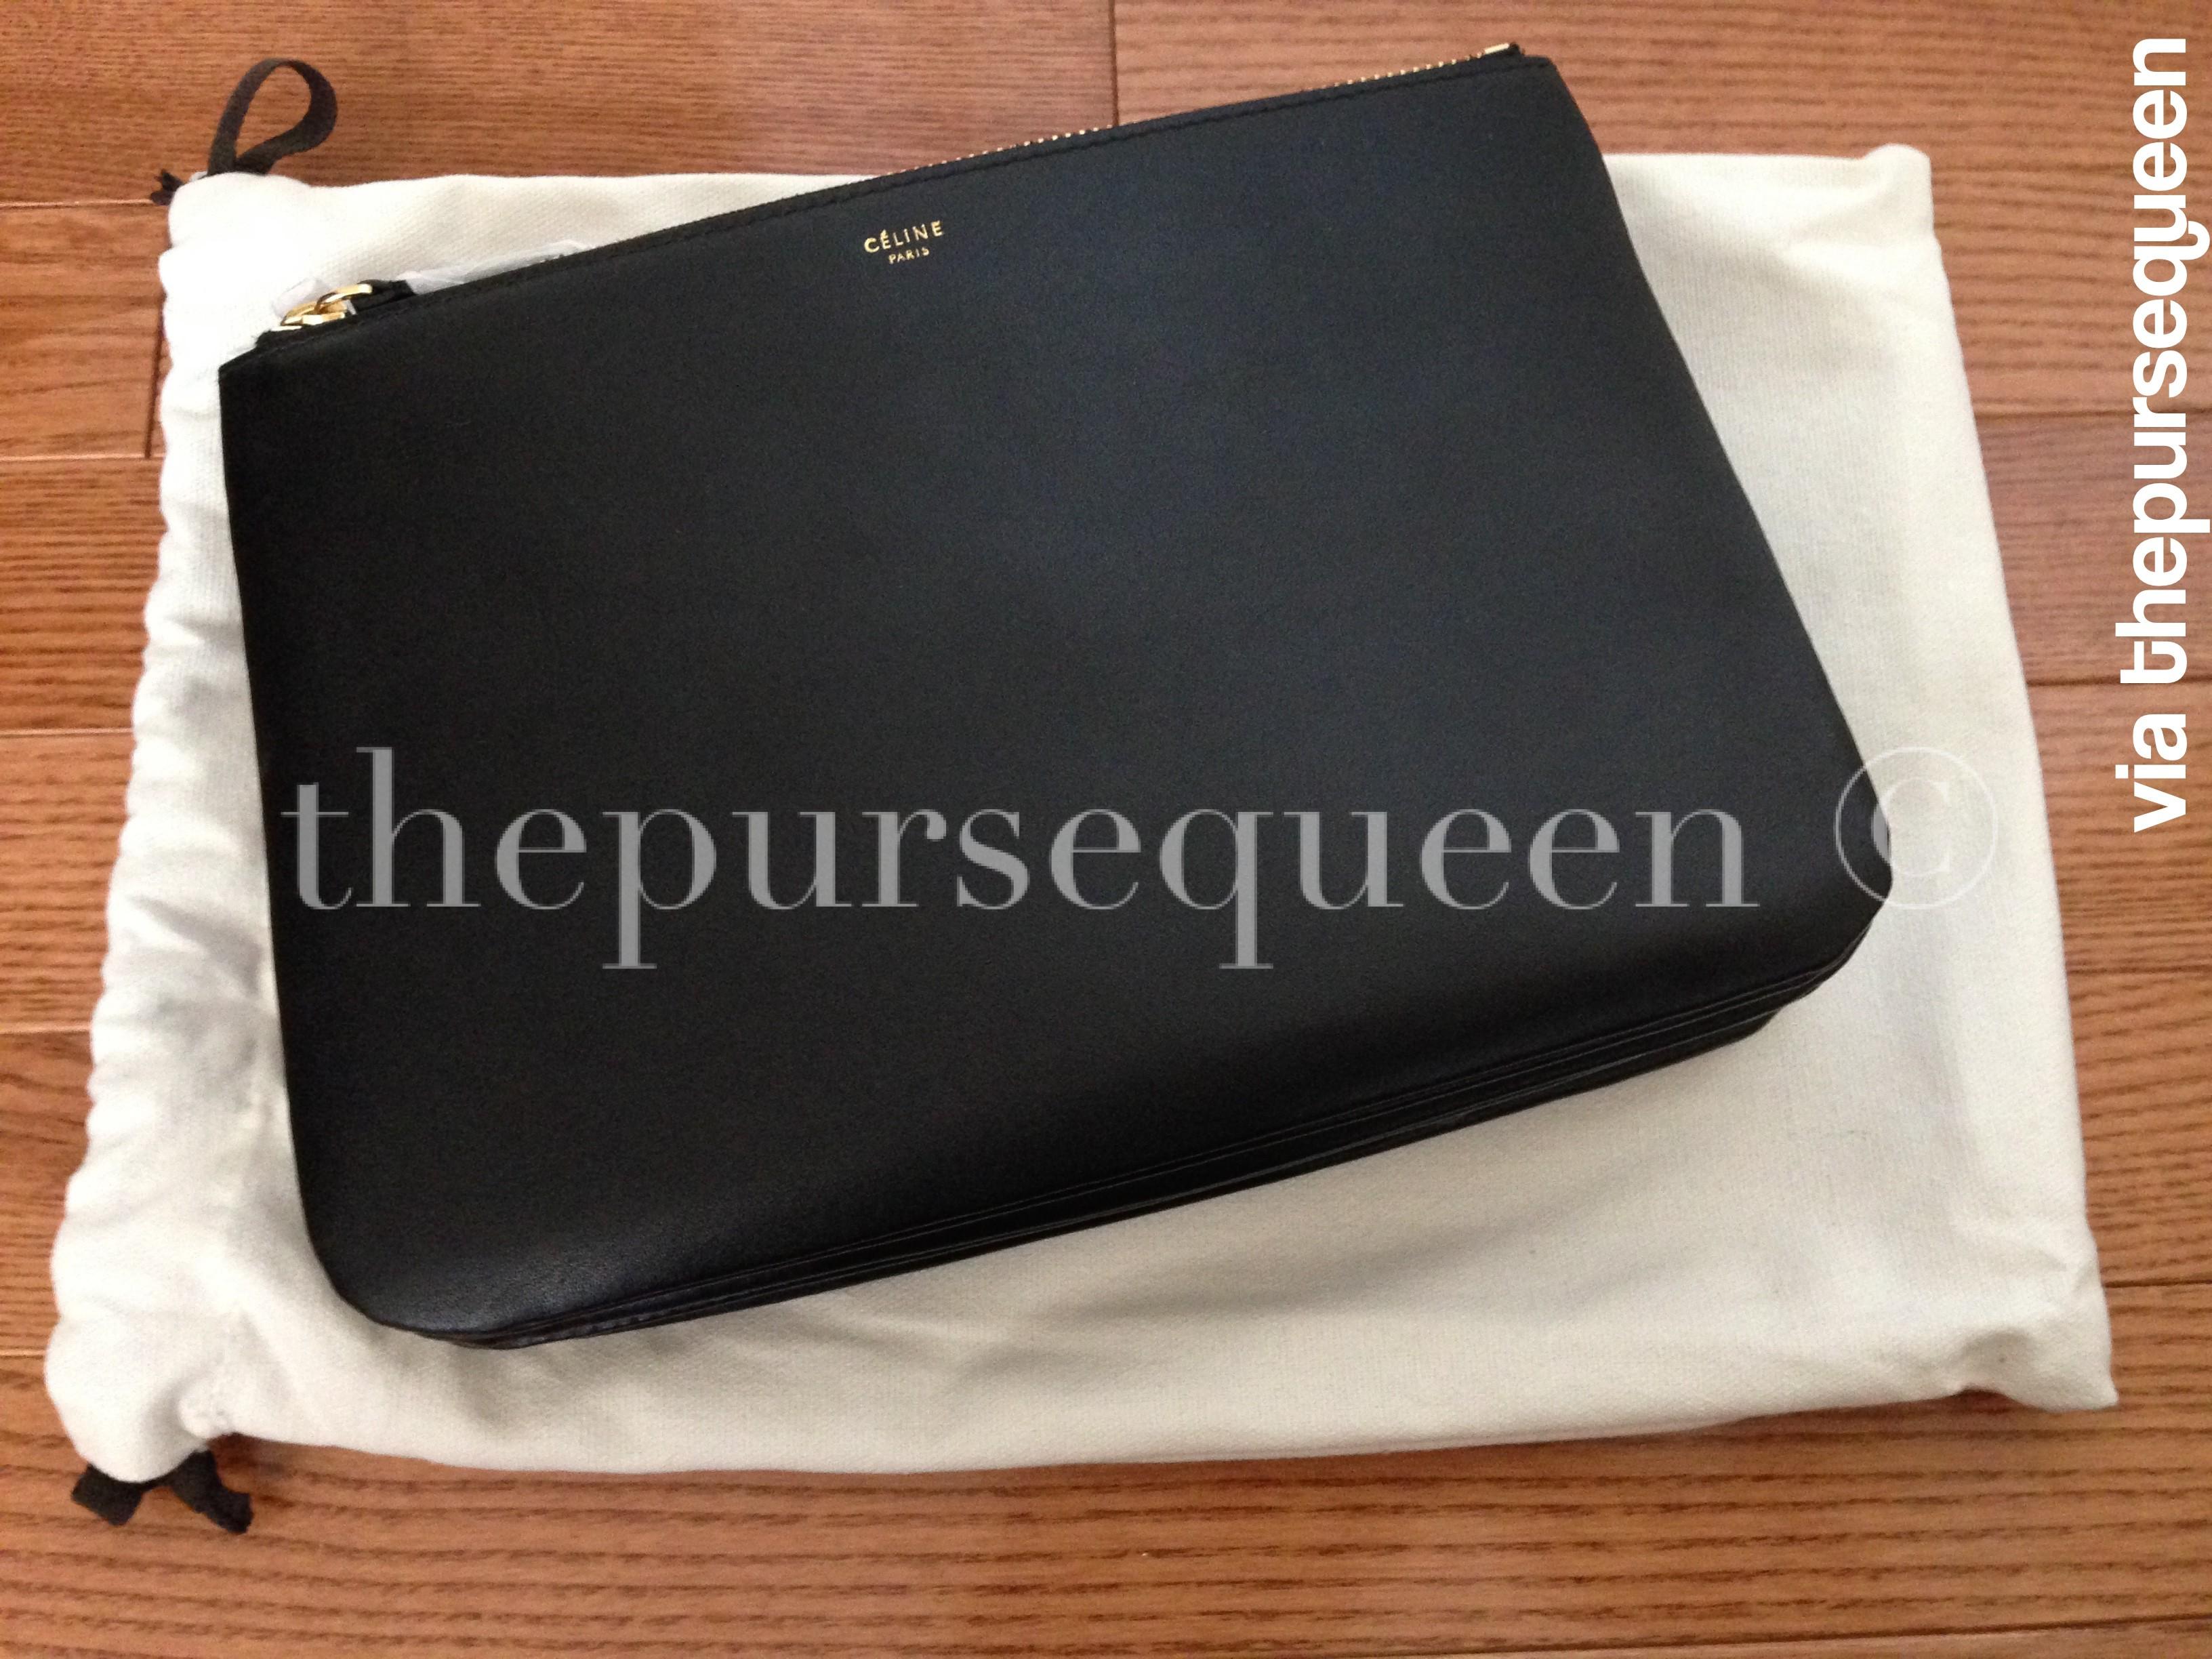 0d1d0a7ccb4061 Authentic & Replica Handbag Reviews by The Purse Queen